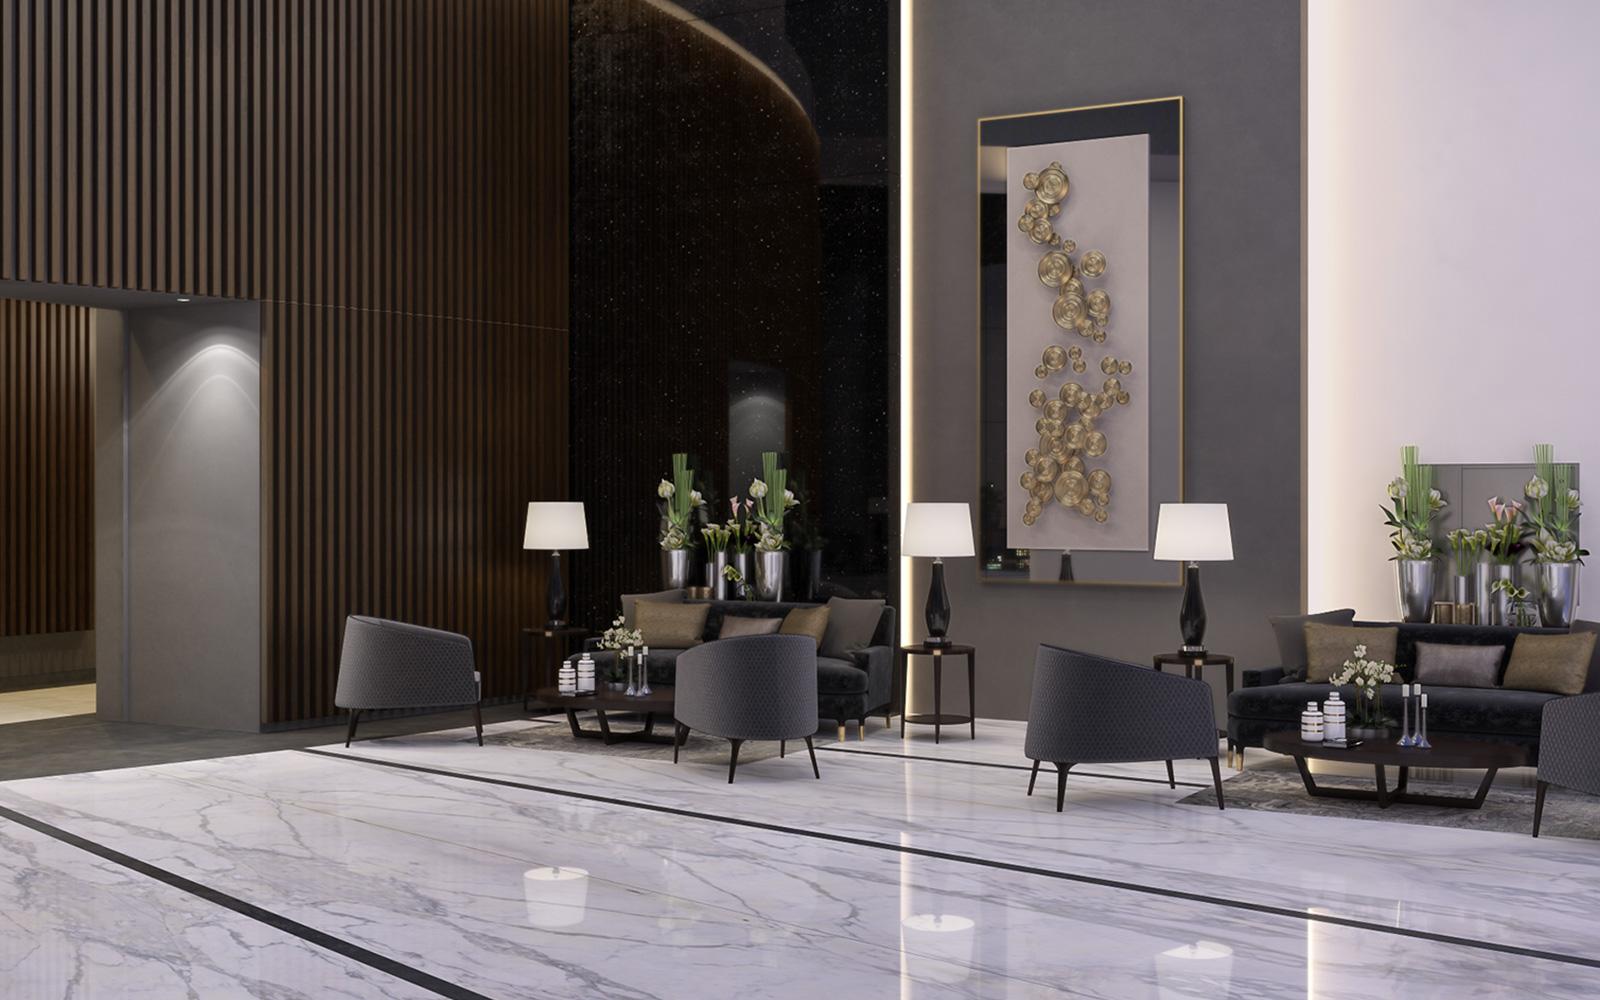 Vogue Design - Saudi Arabia Beyat Plaza5